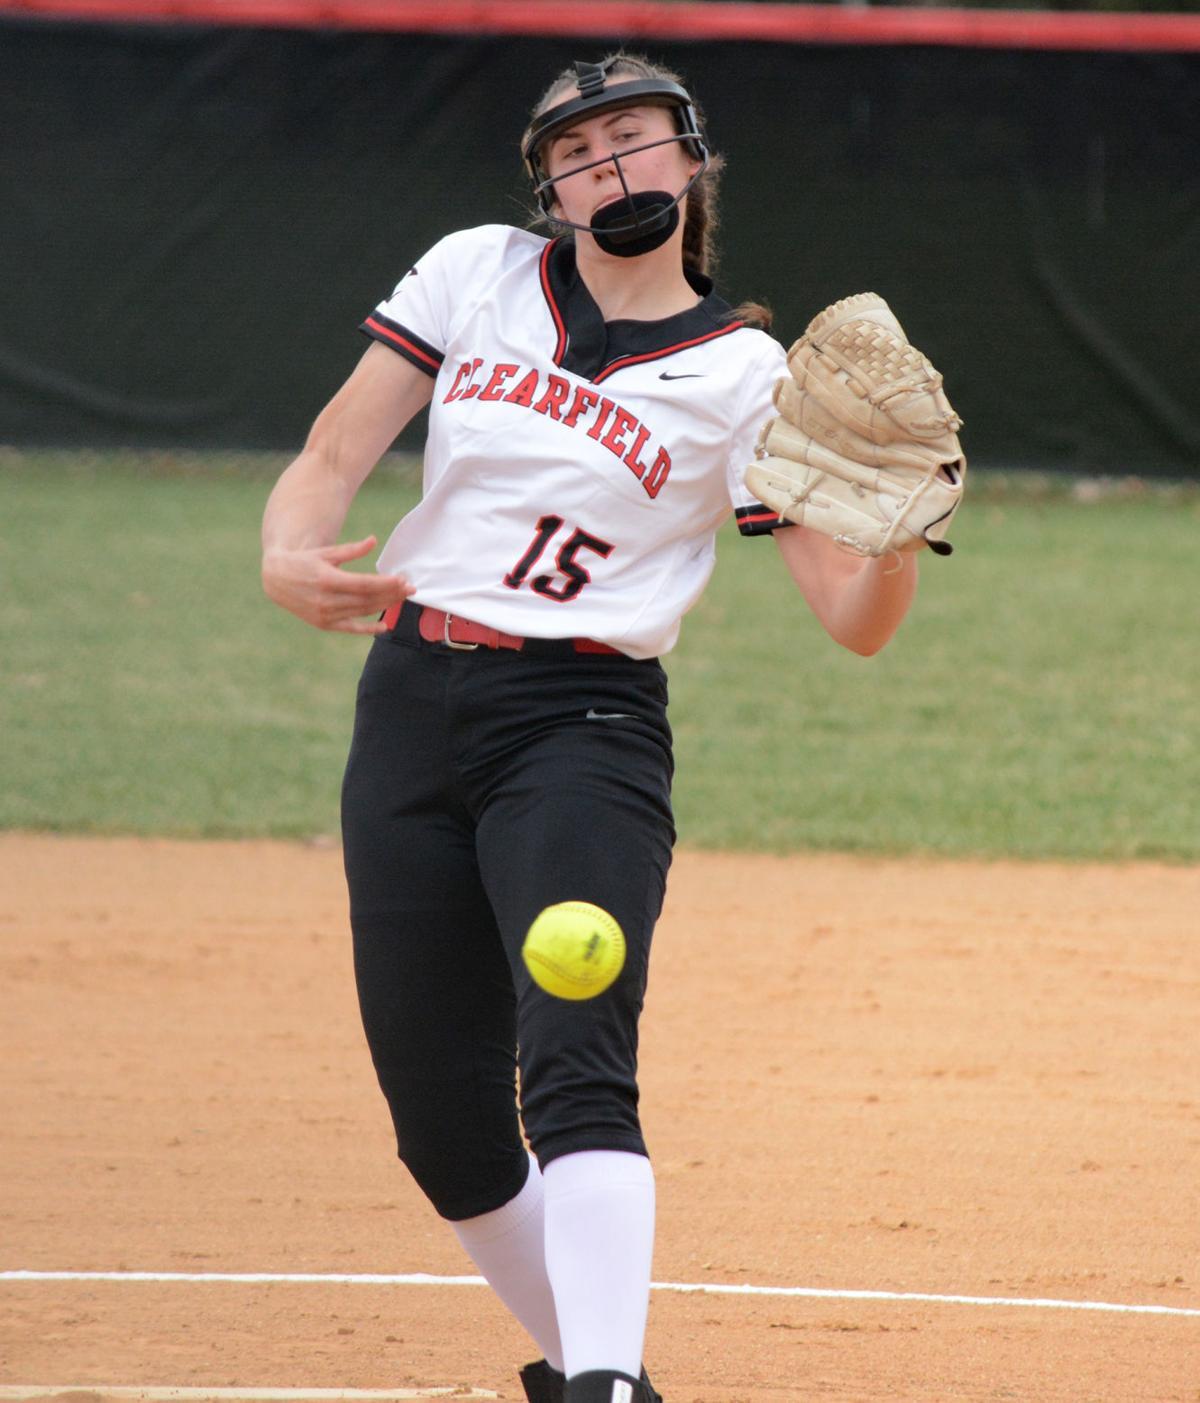 Emma Hipps pitching